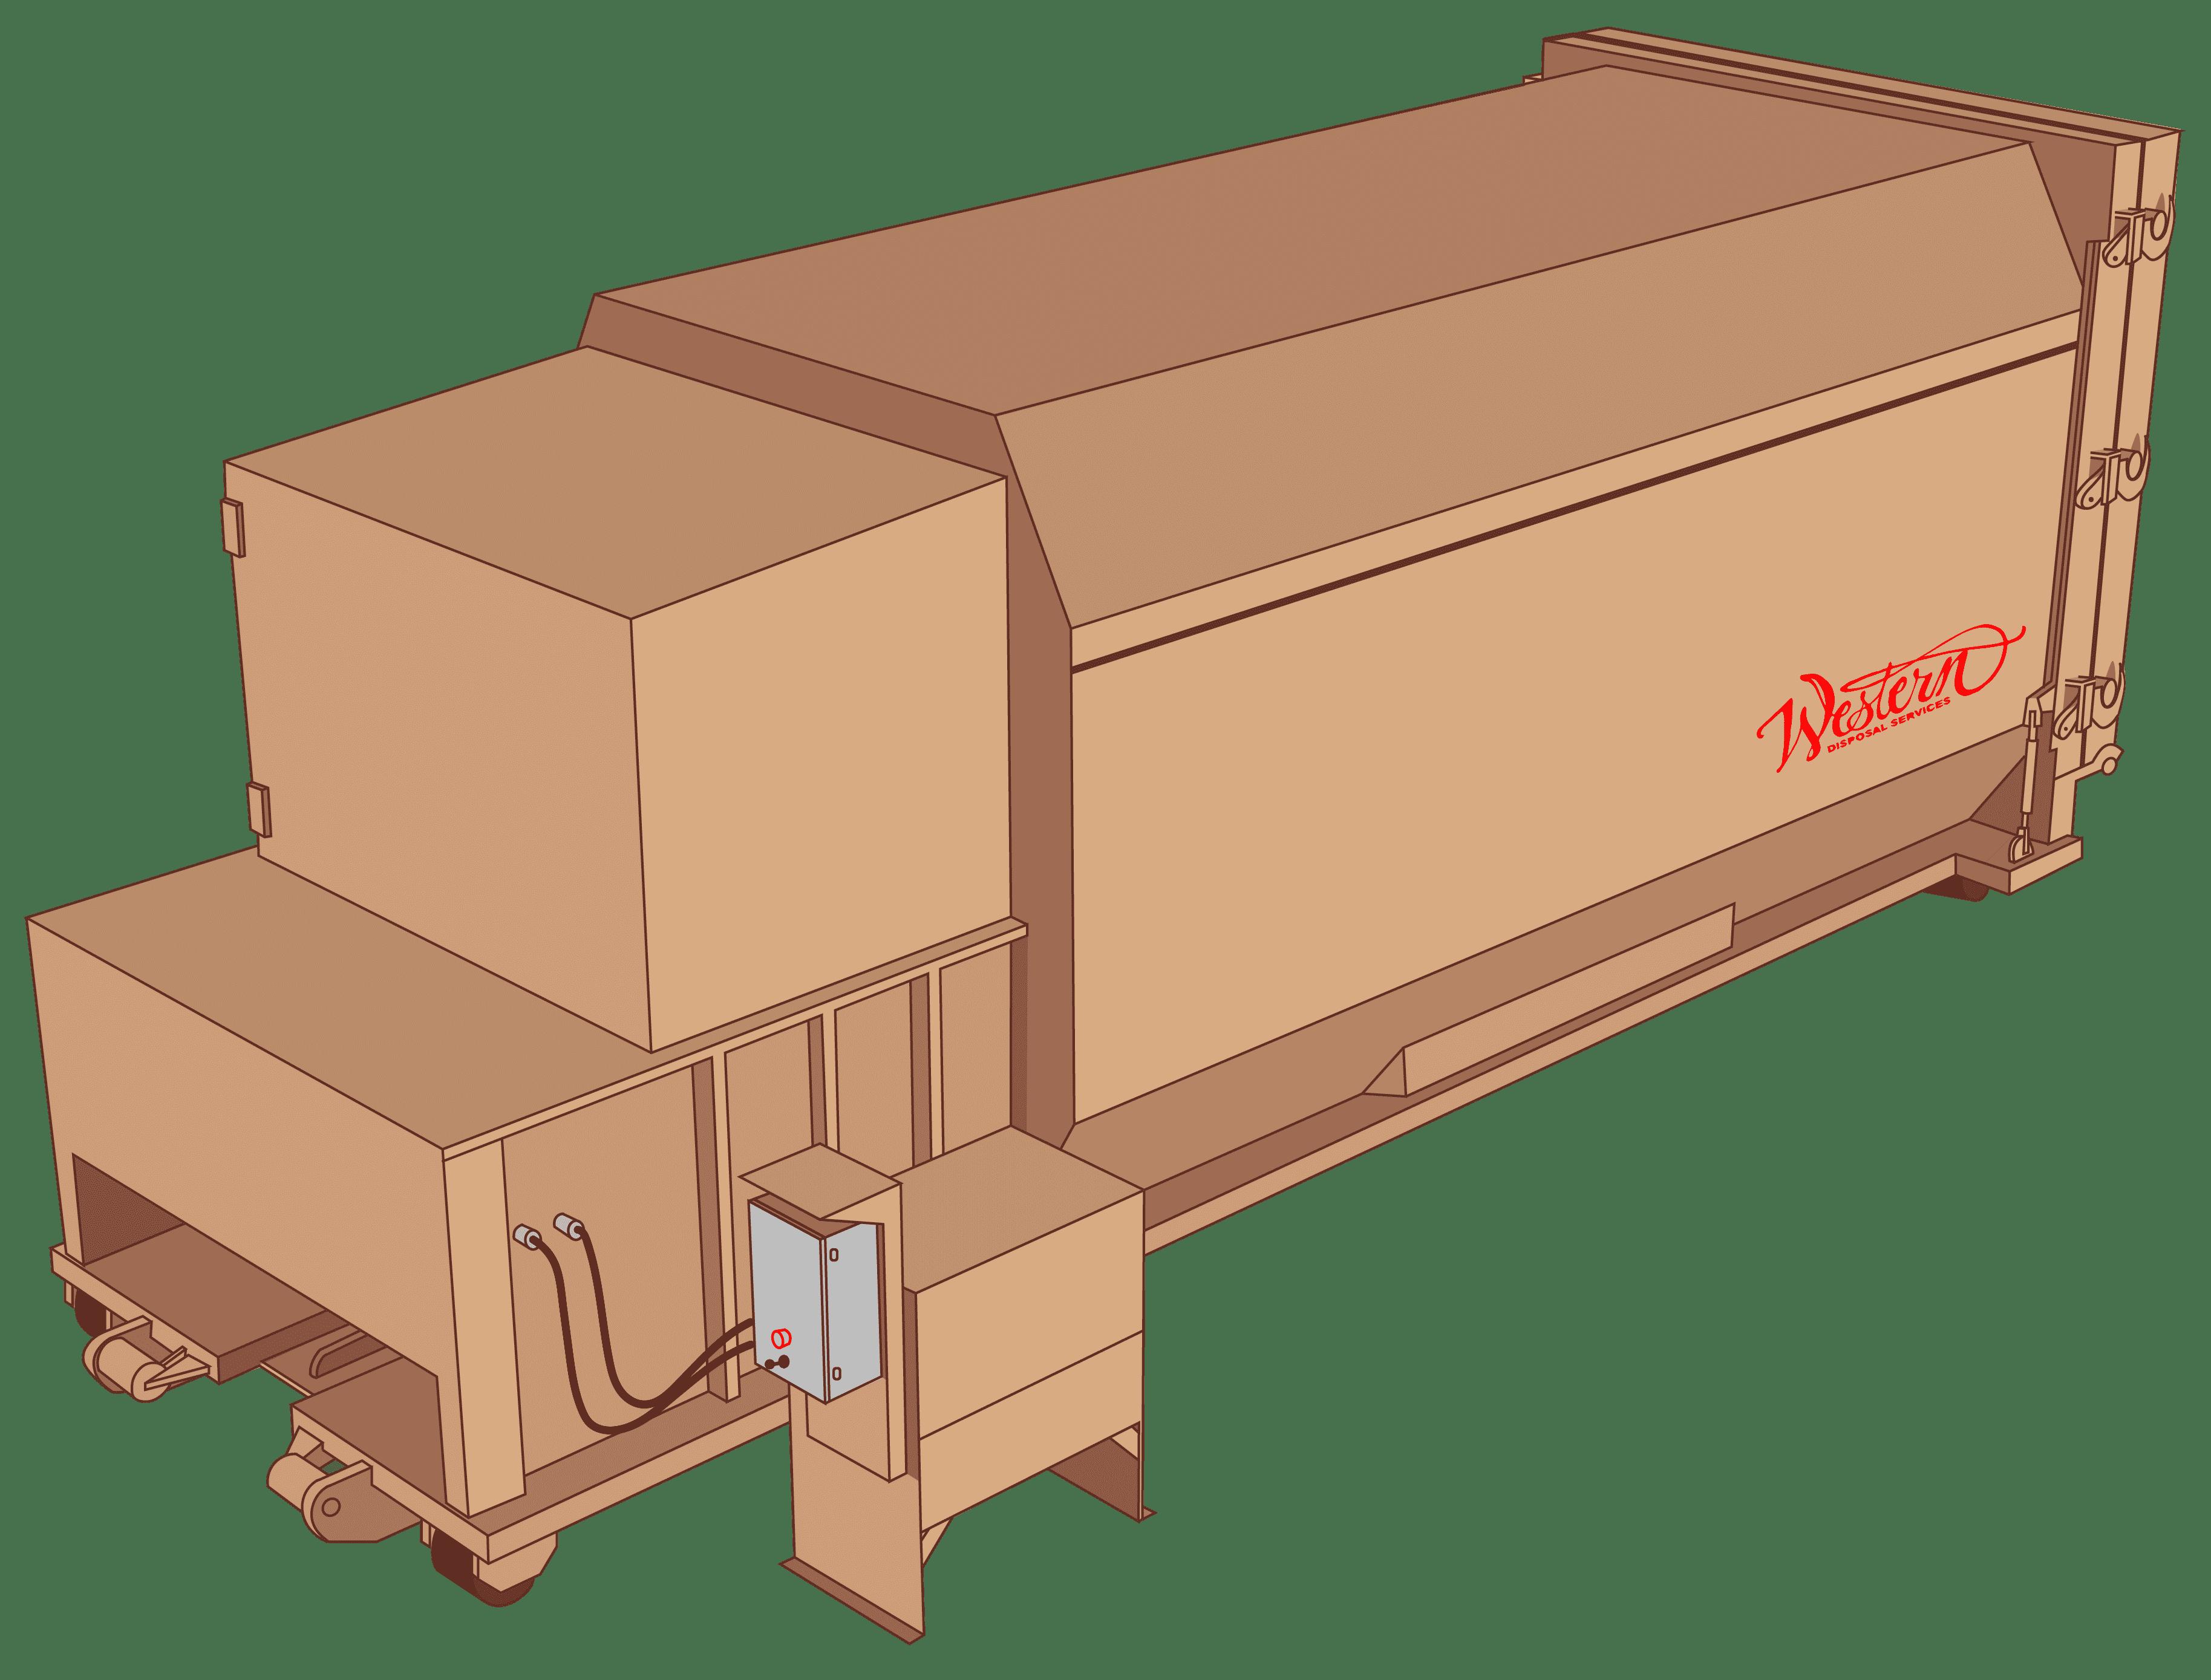 Compactor illustration